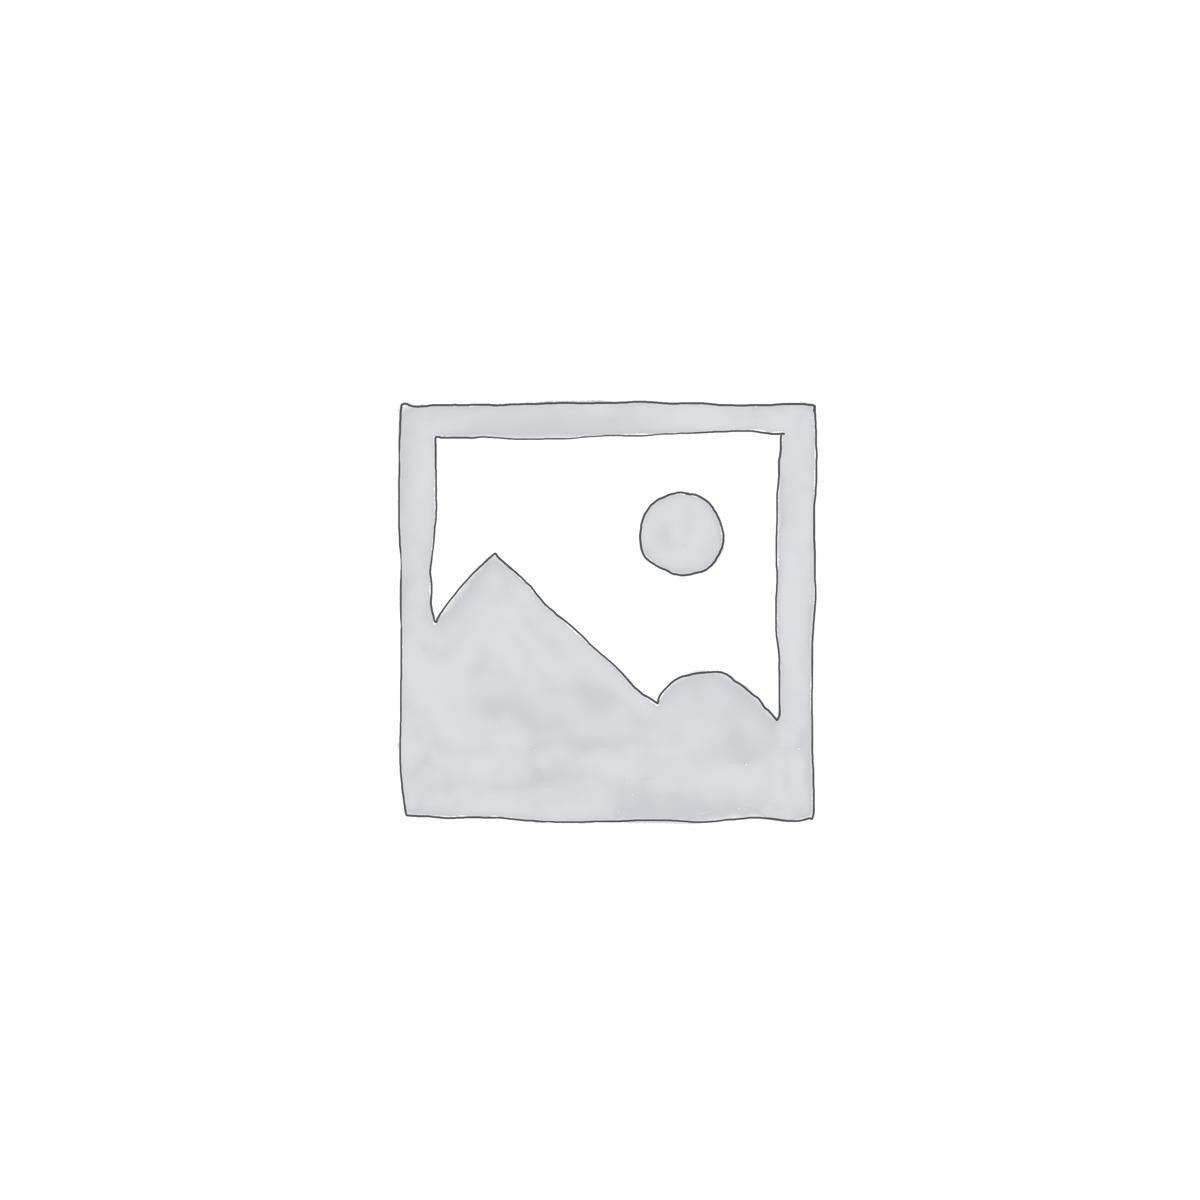 Exotic Forest Landscape Wallpaper Mural